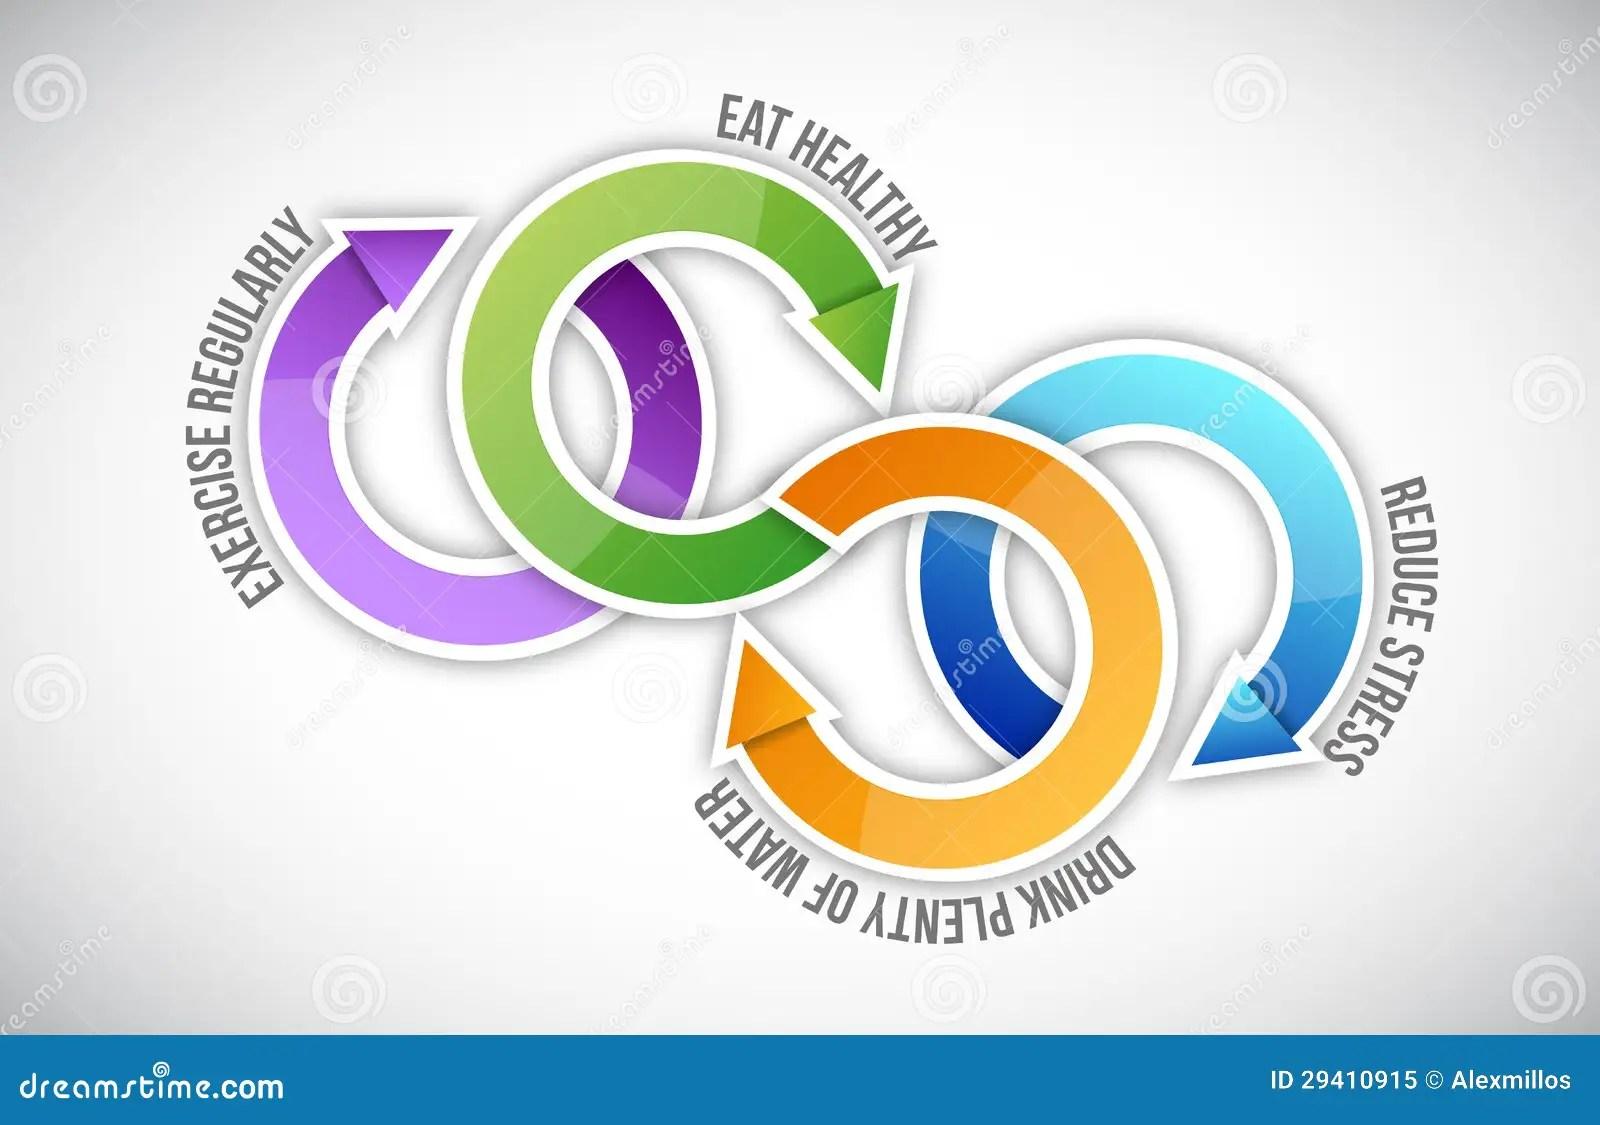 harvard food plate diagram shrew skeleton labeled healthy venn mehmomblog